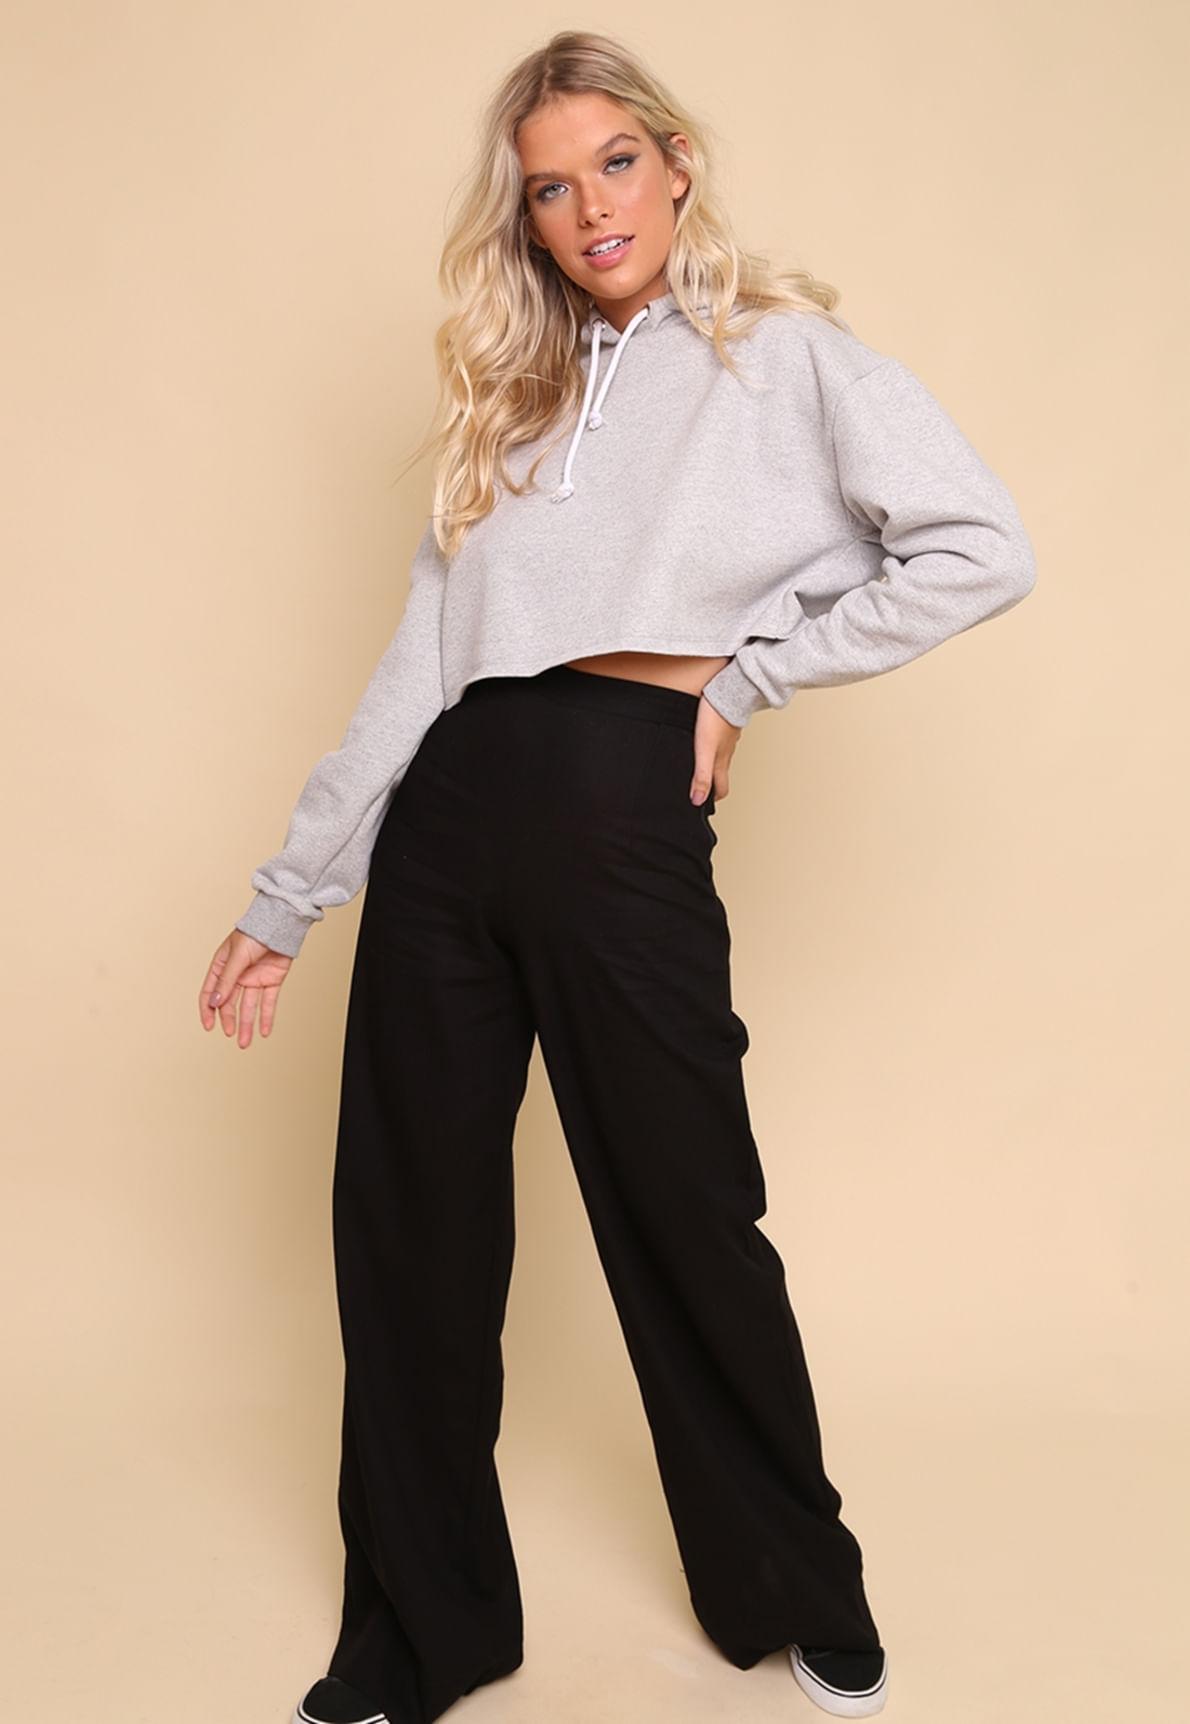 30309-calca-pantalona-preta-gigi-mundo-lolita-01